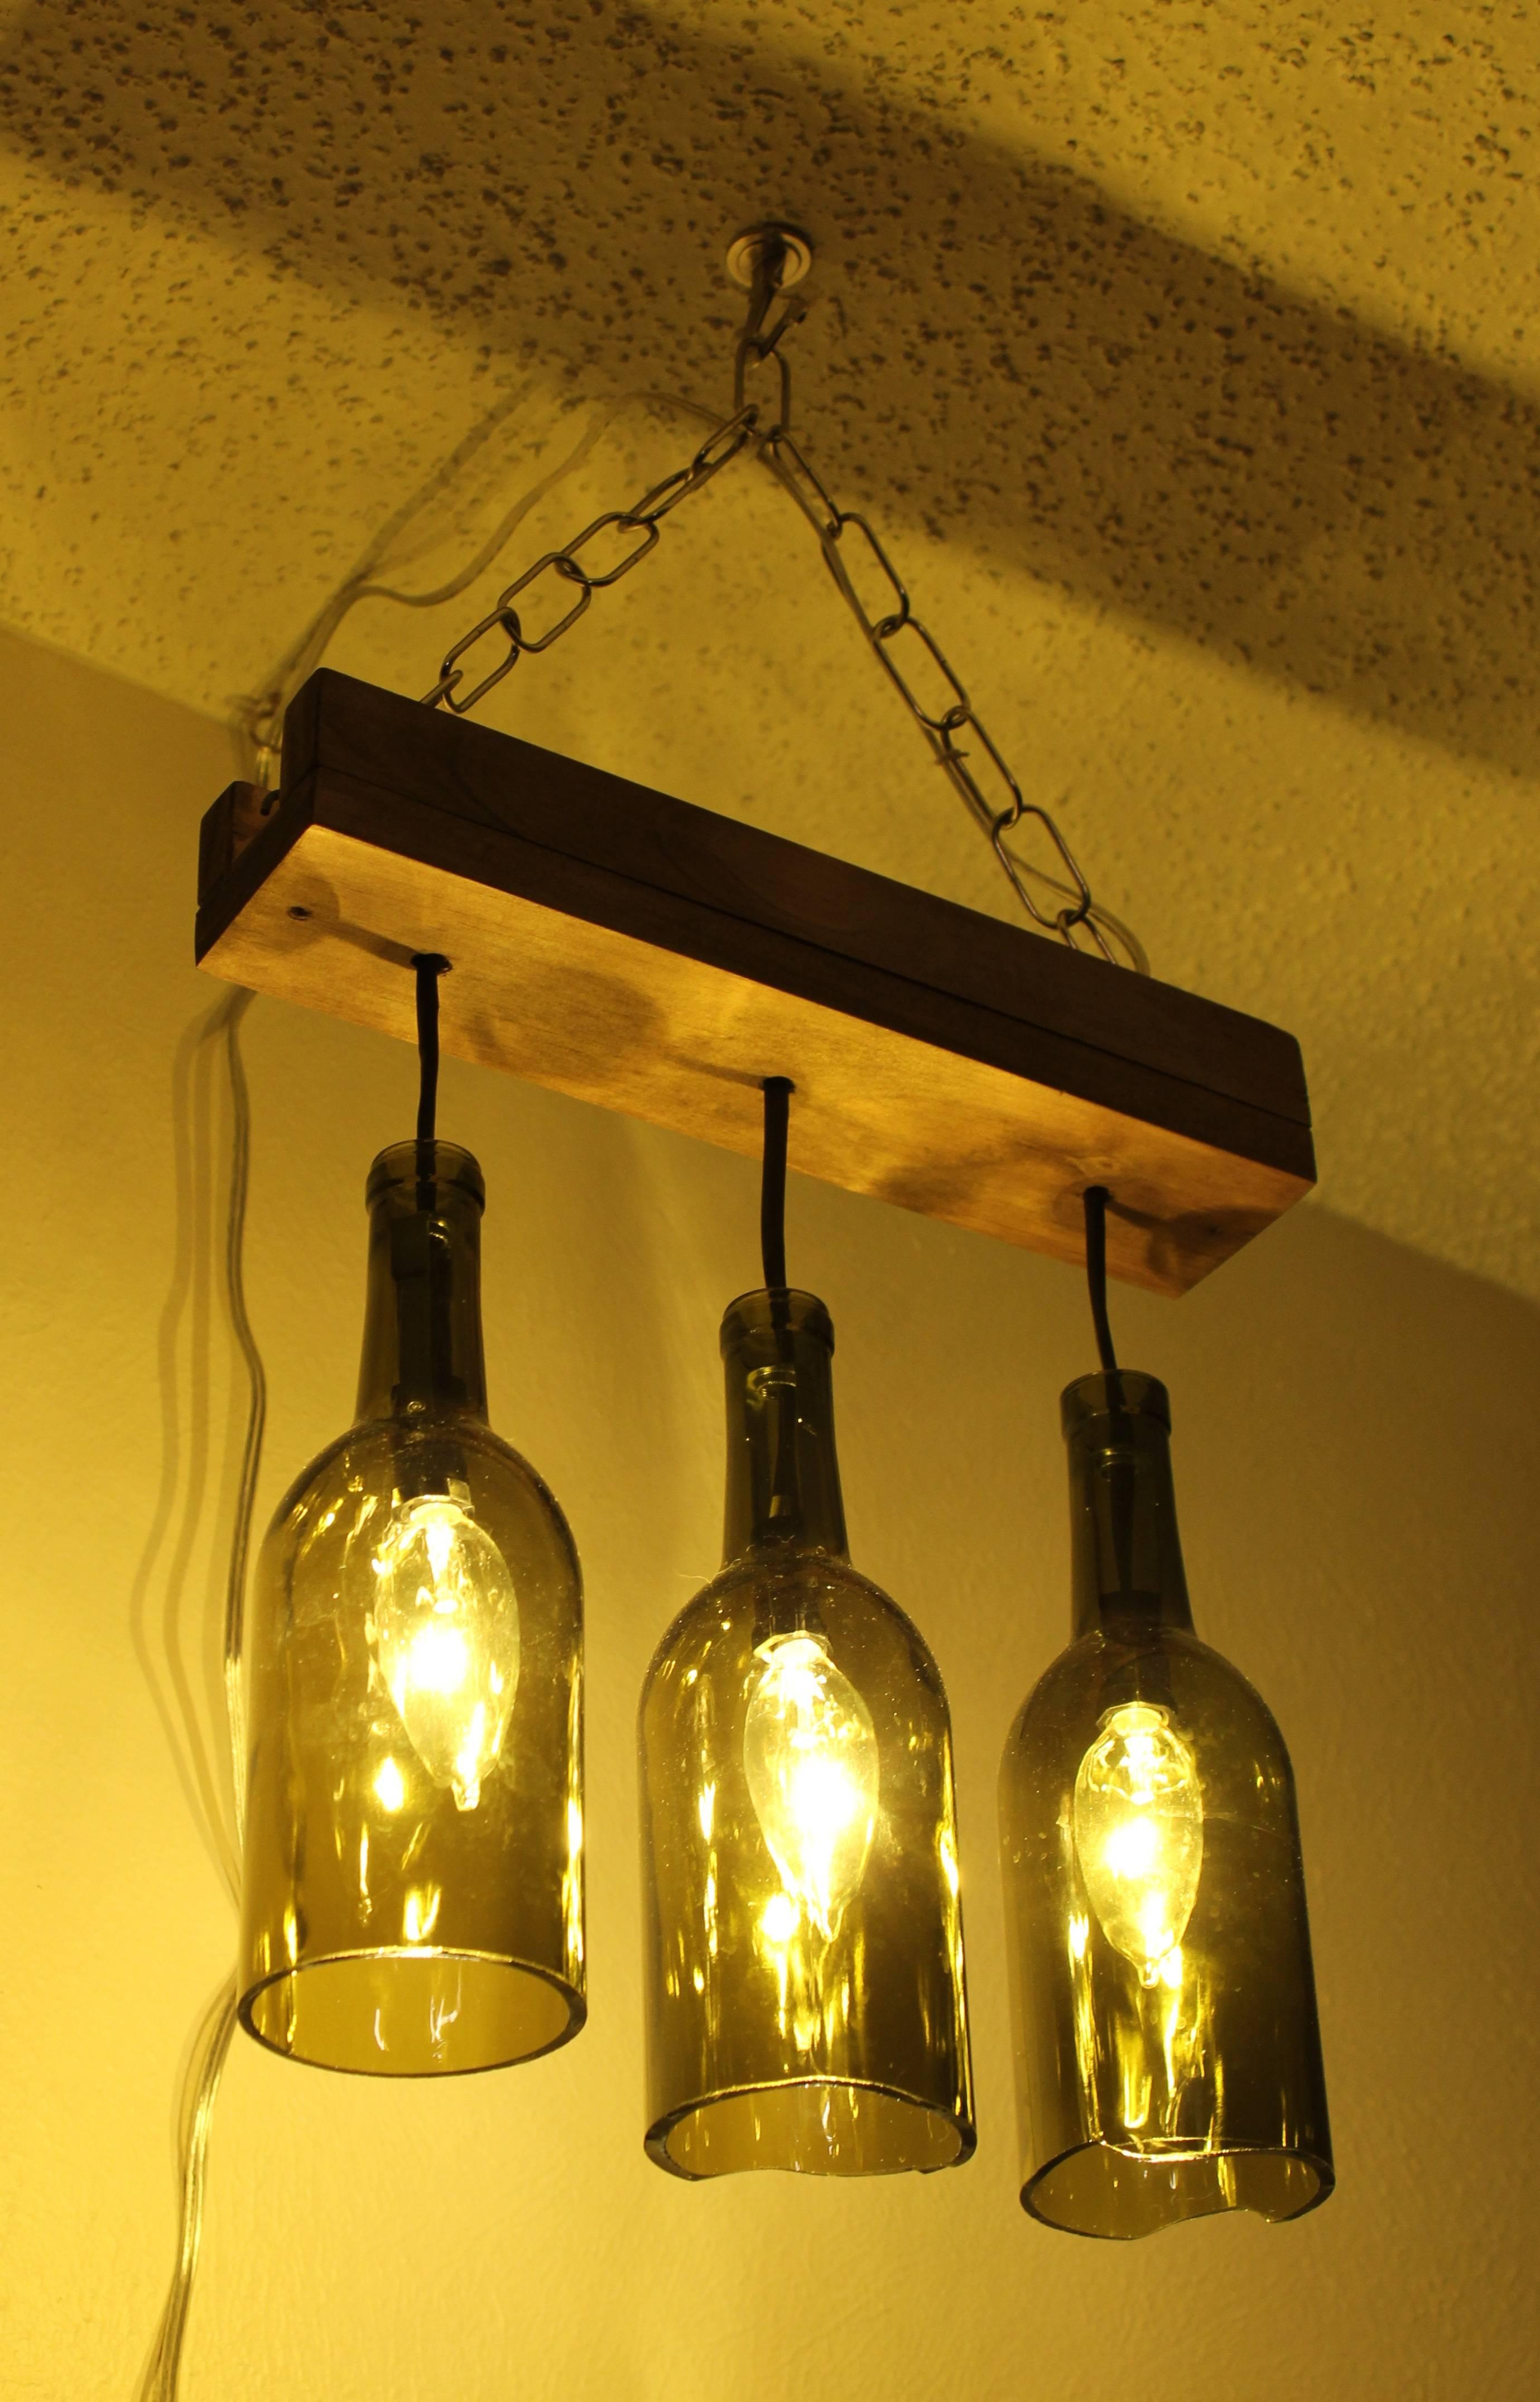 Making A Wine Bottle Chandelier | Laura Makes regarding Wine Glass Lights Fixtures (Image 10 of 15)